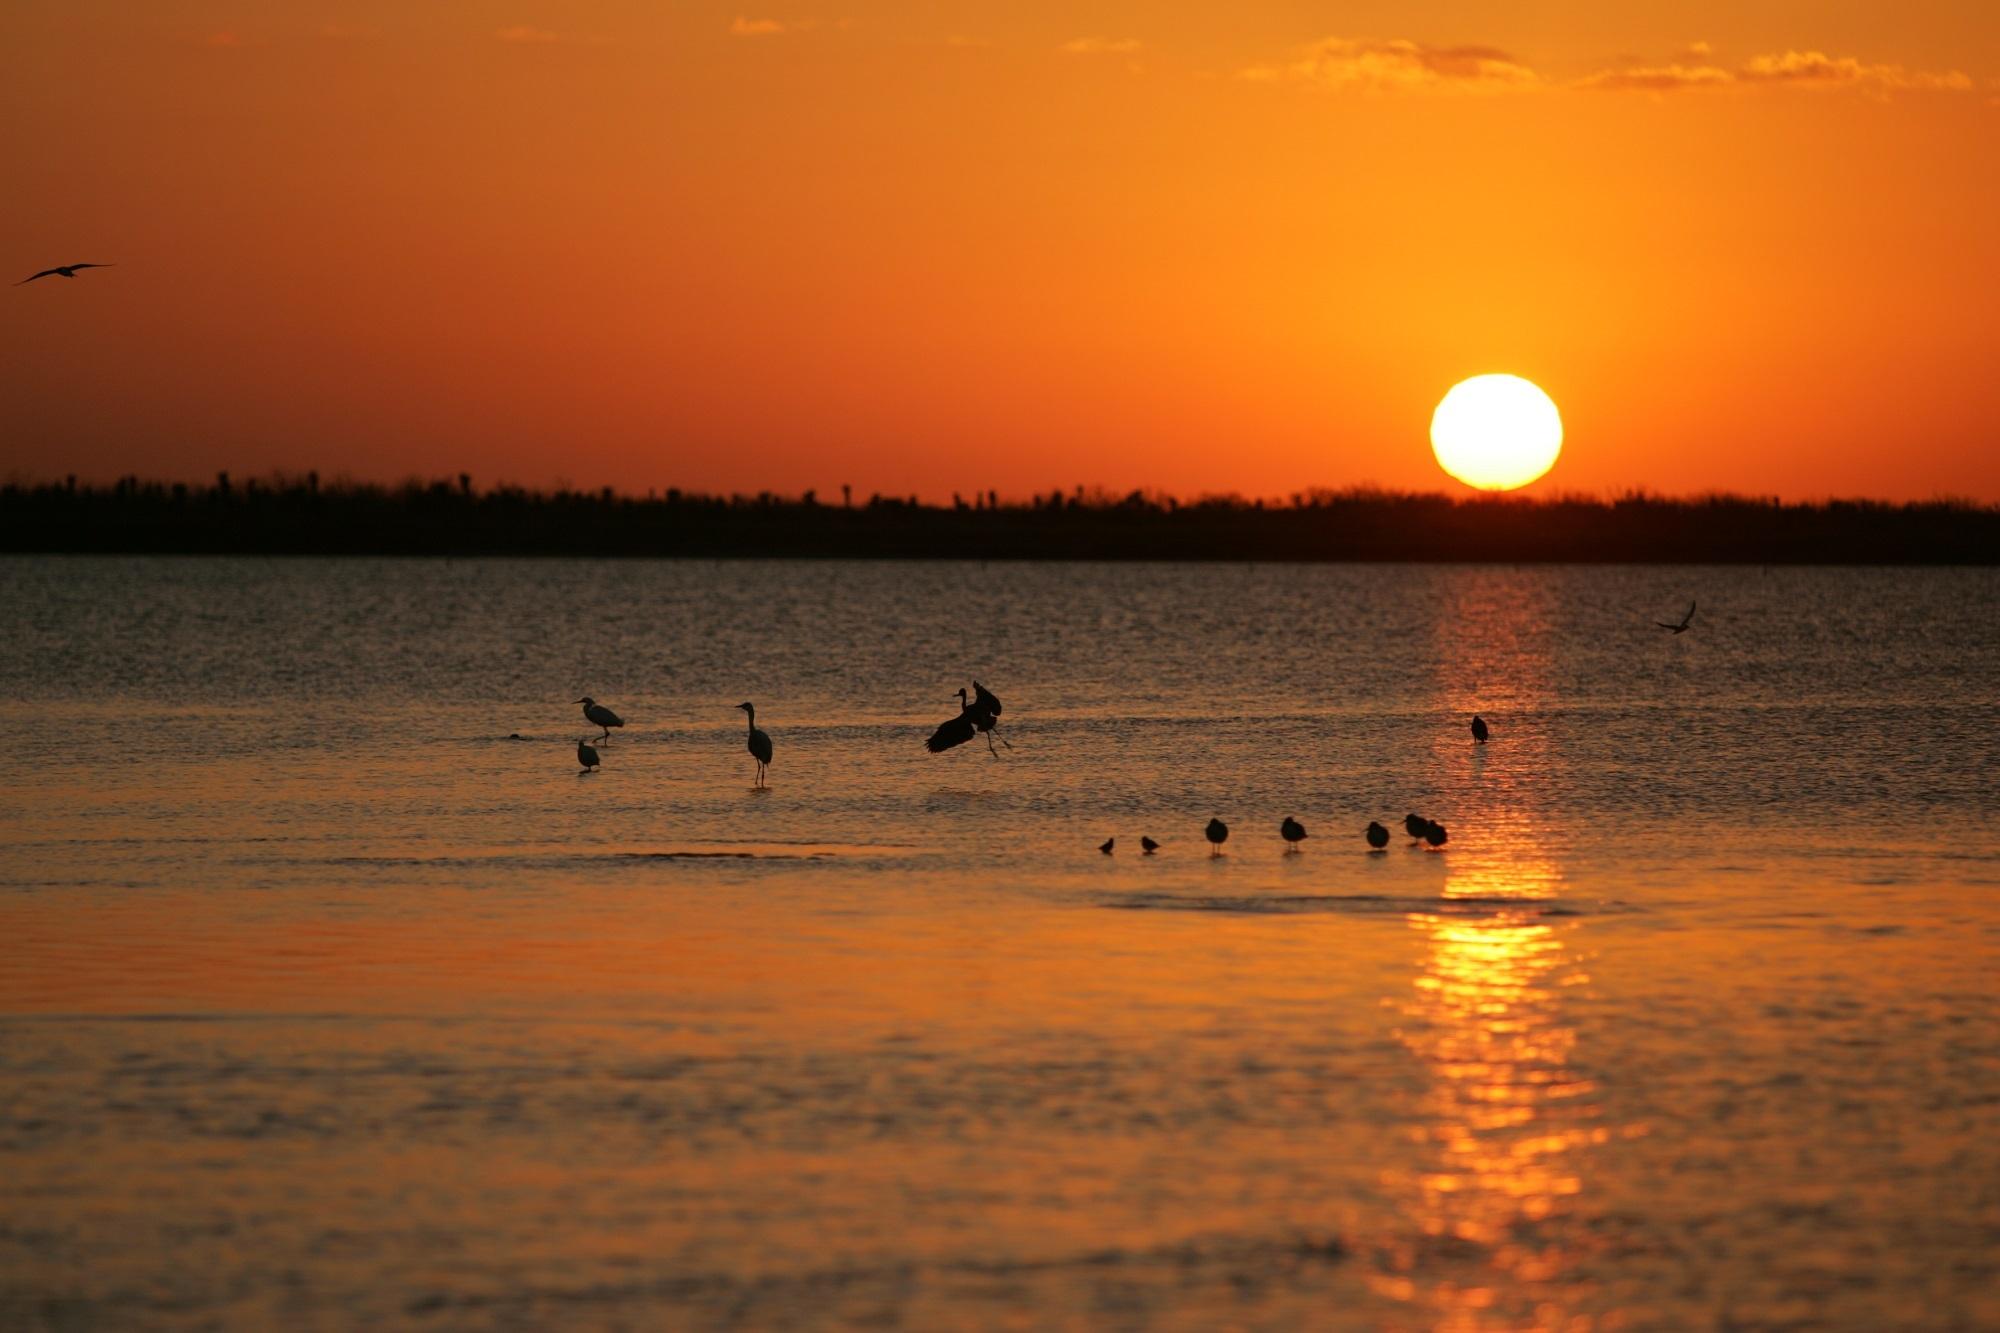 Birds in the river photo